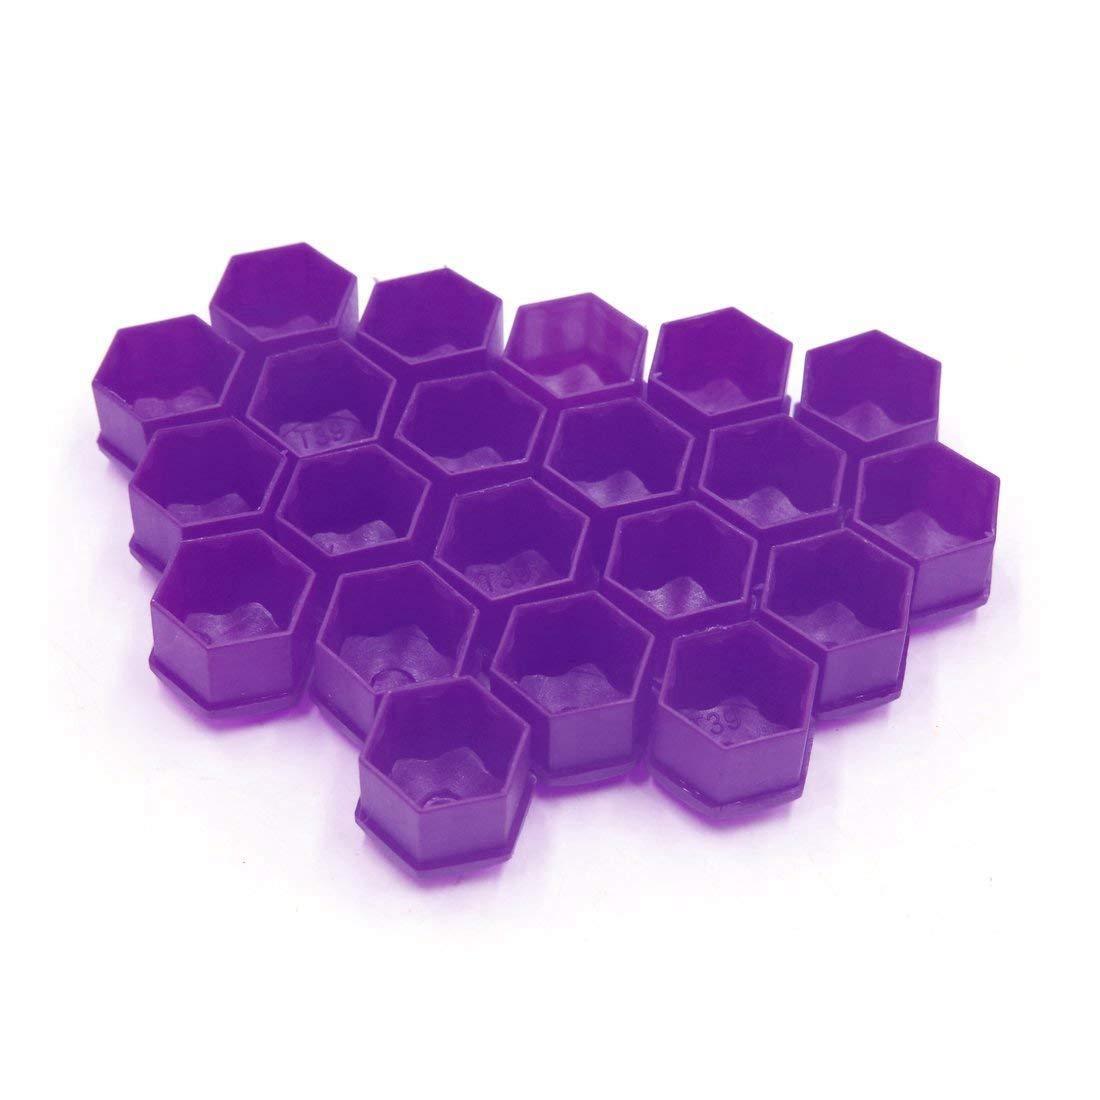 Cikuso 20 pcs Purple Plastic Wheel Lug Nut Bolt Cover Cap with Removal Tool for Car,17mm